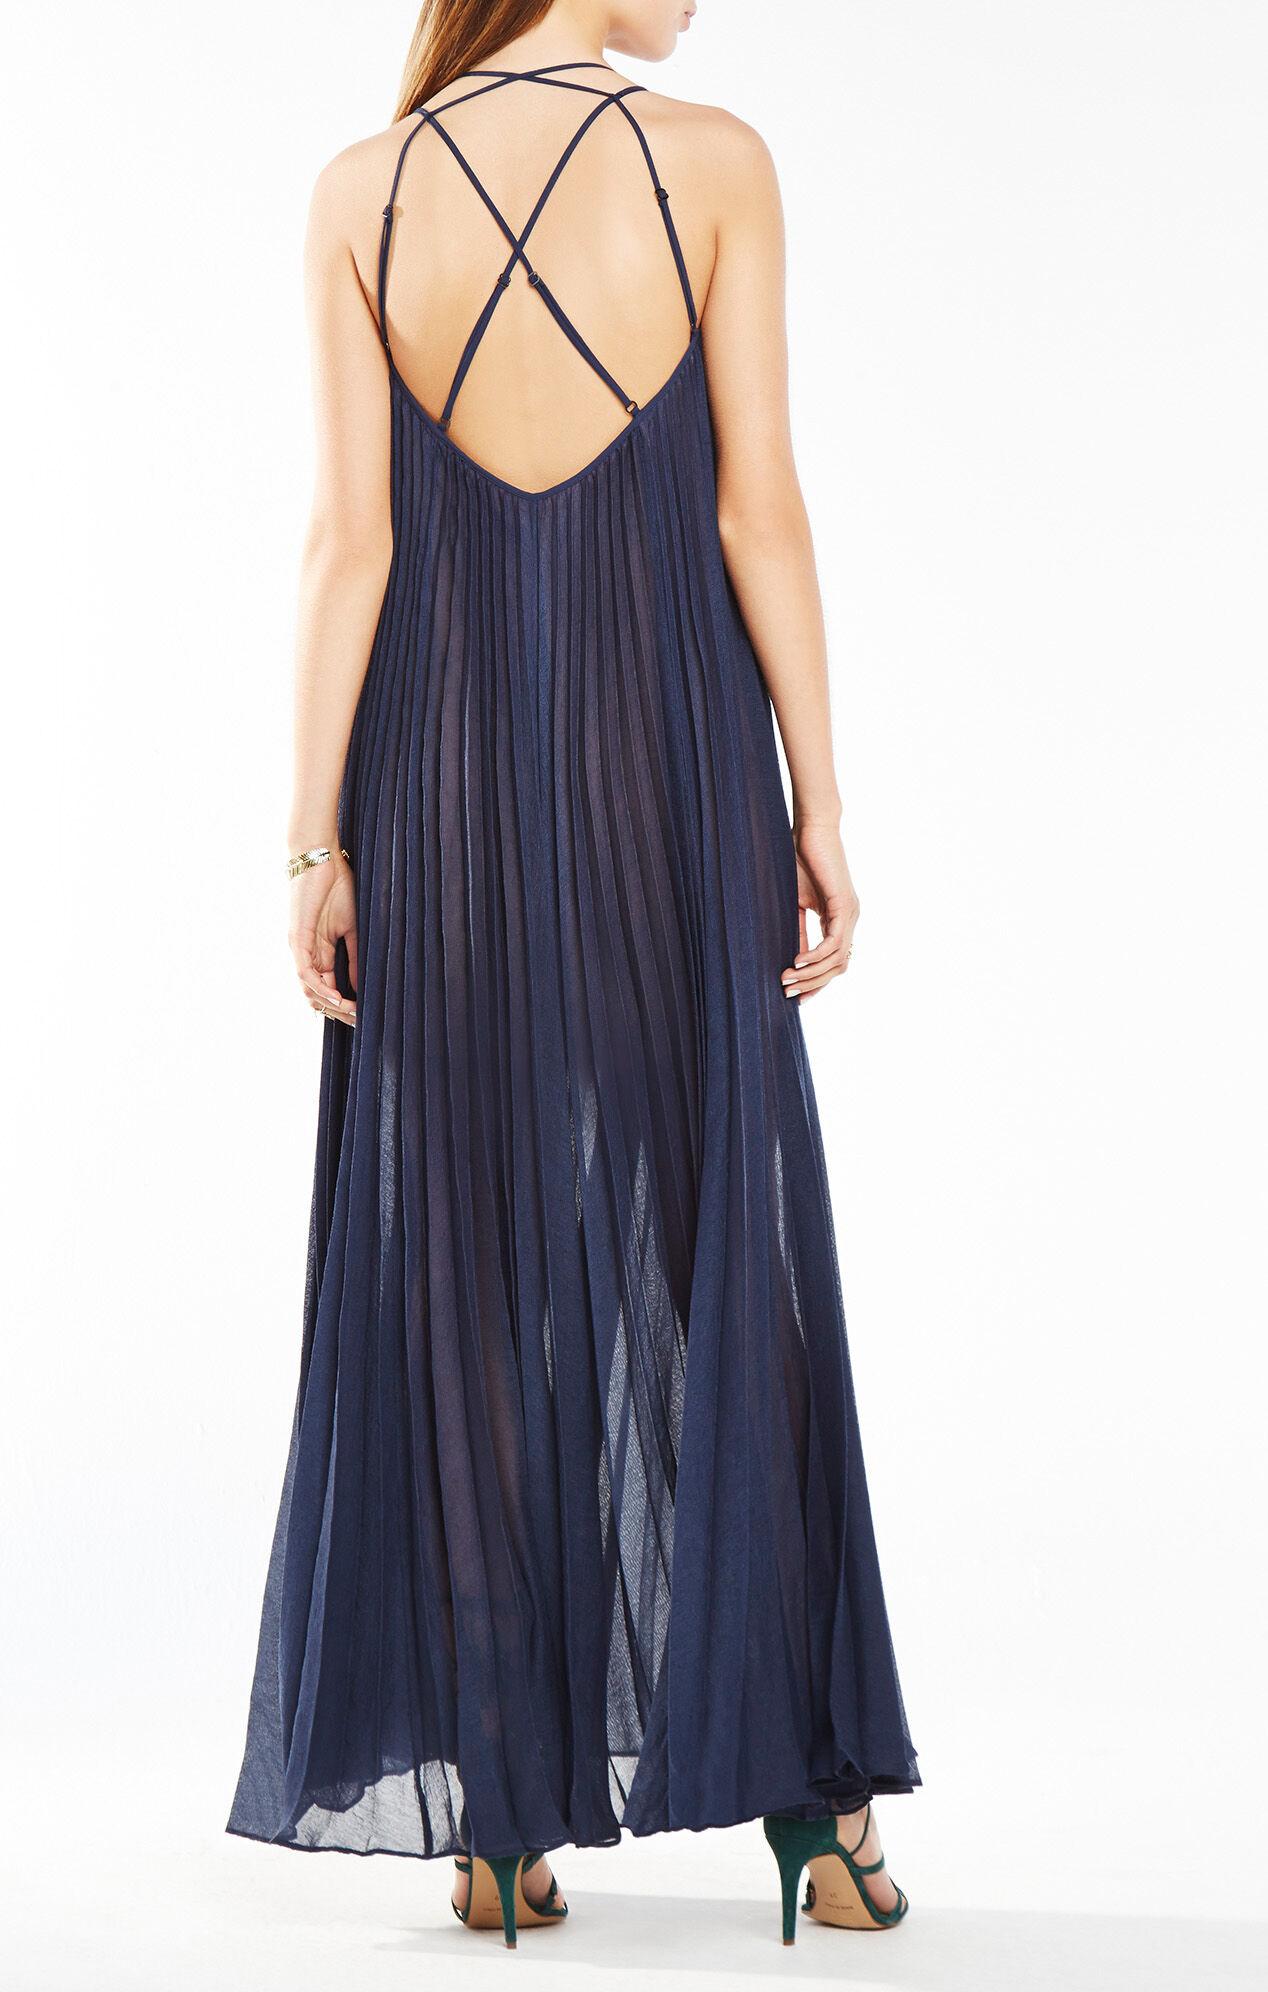 Bcbg maxi dresses